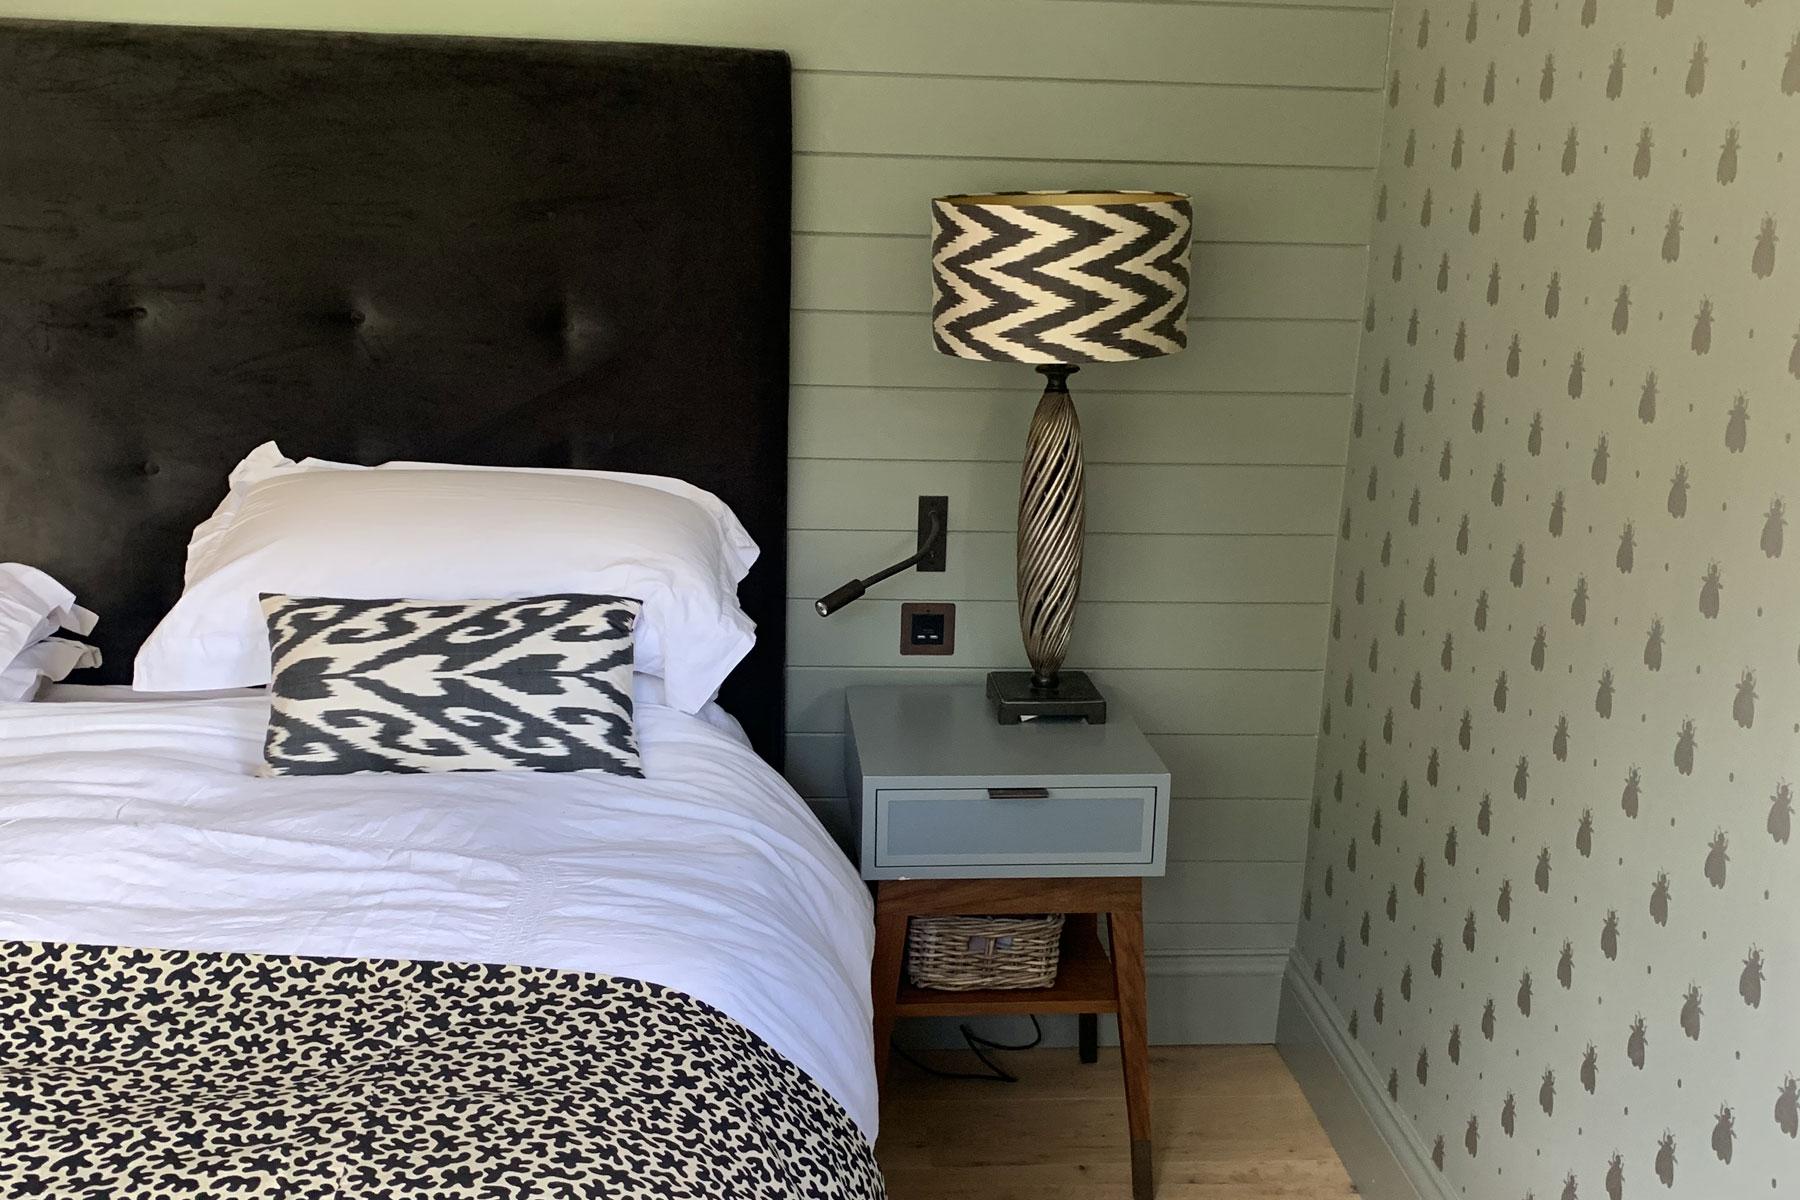 Scott-Masson Interior Design Business and Home Interiors